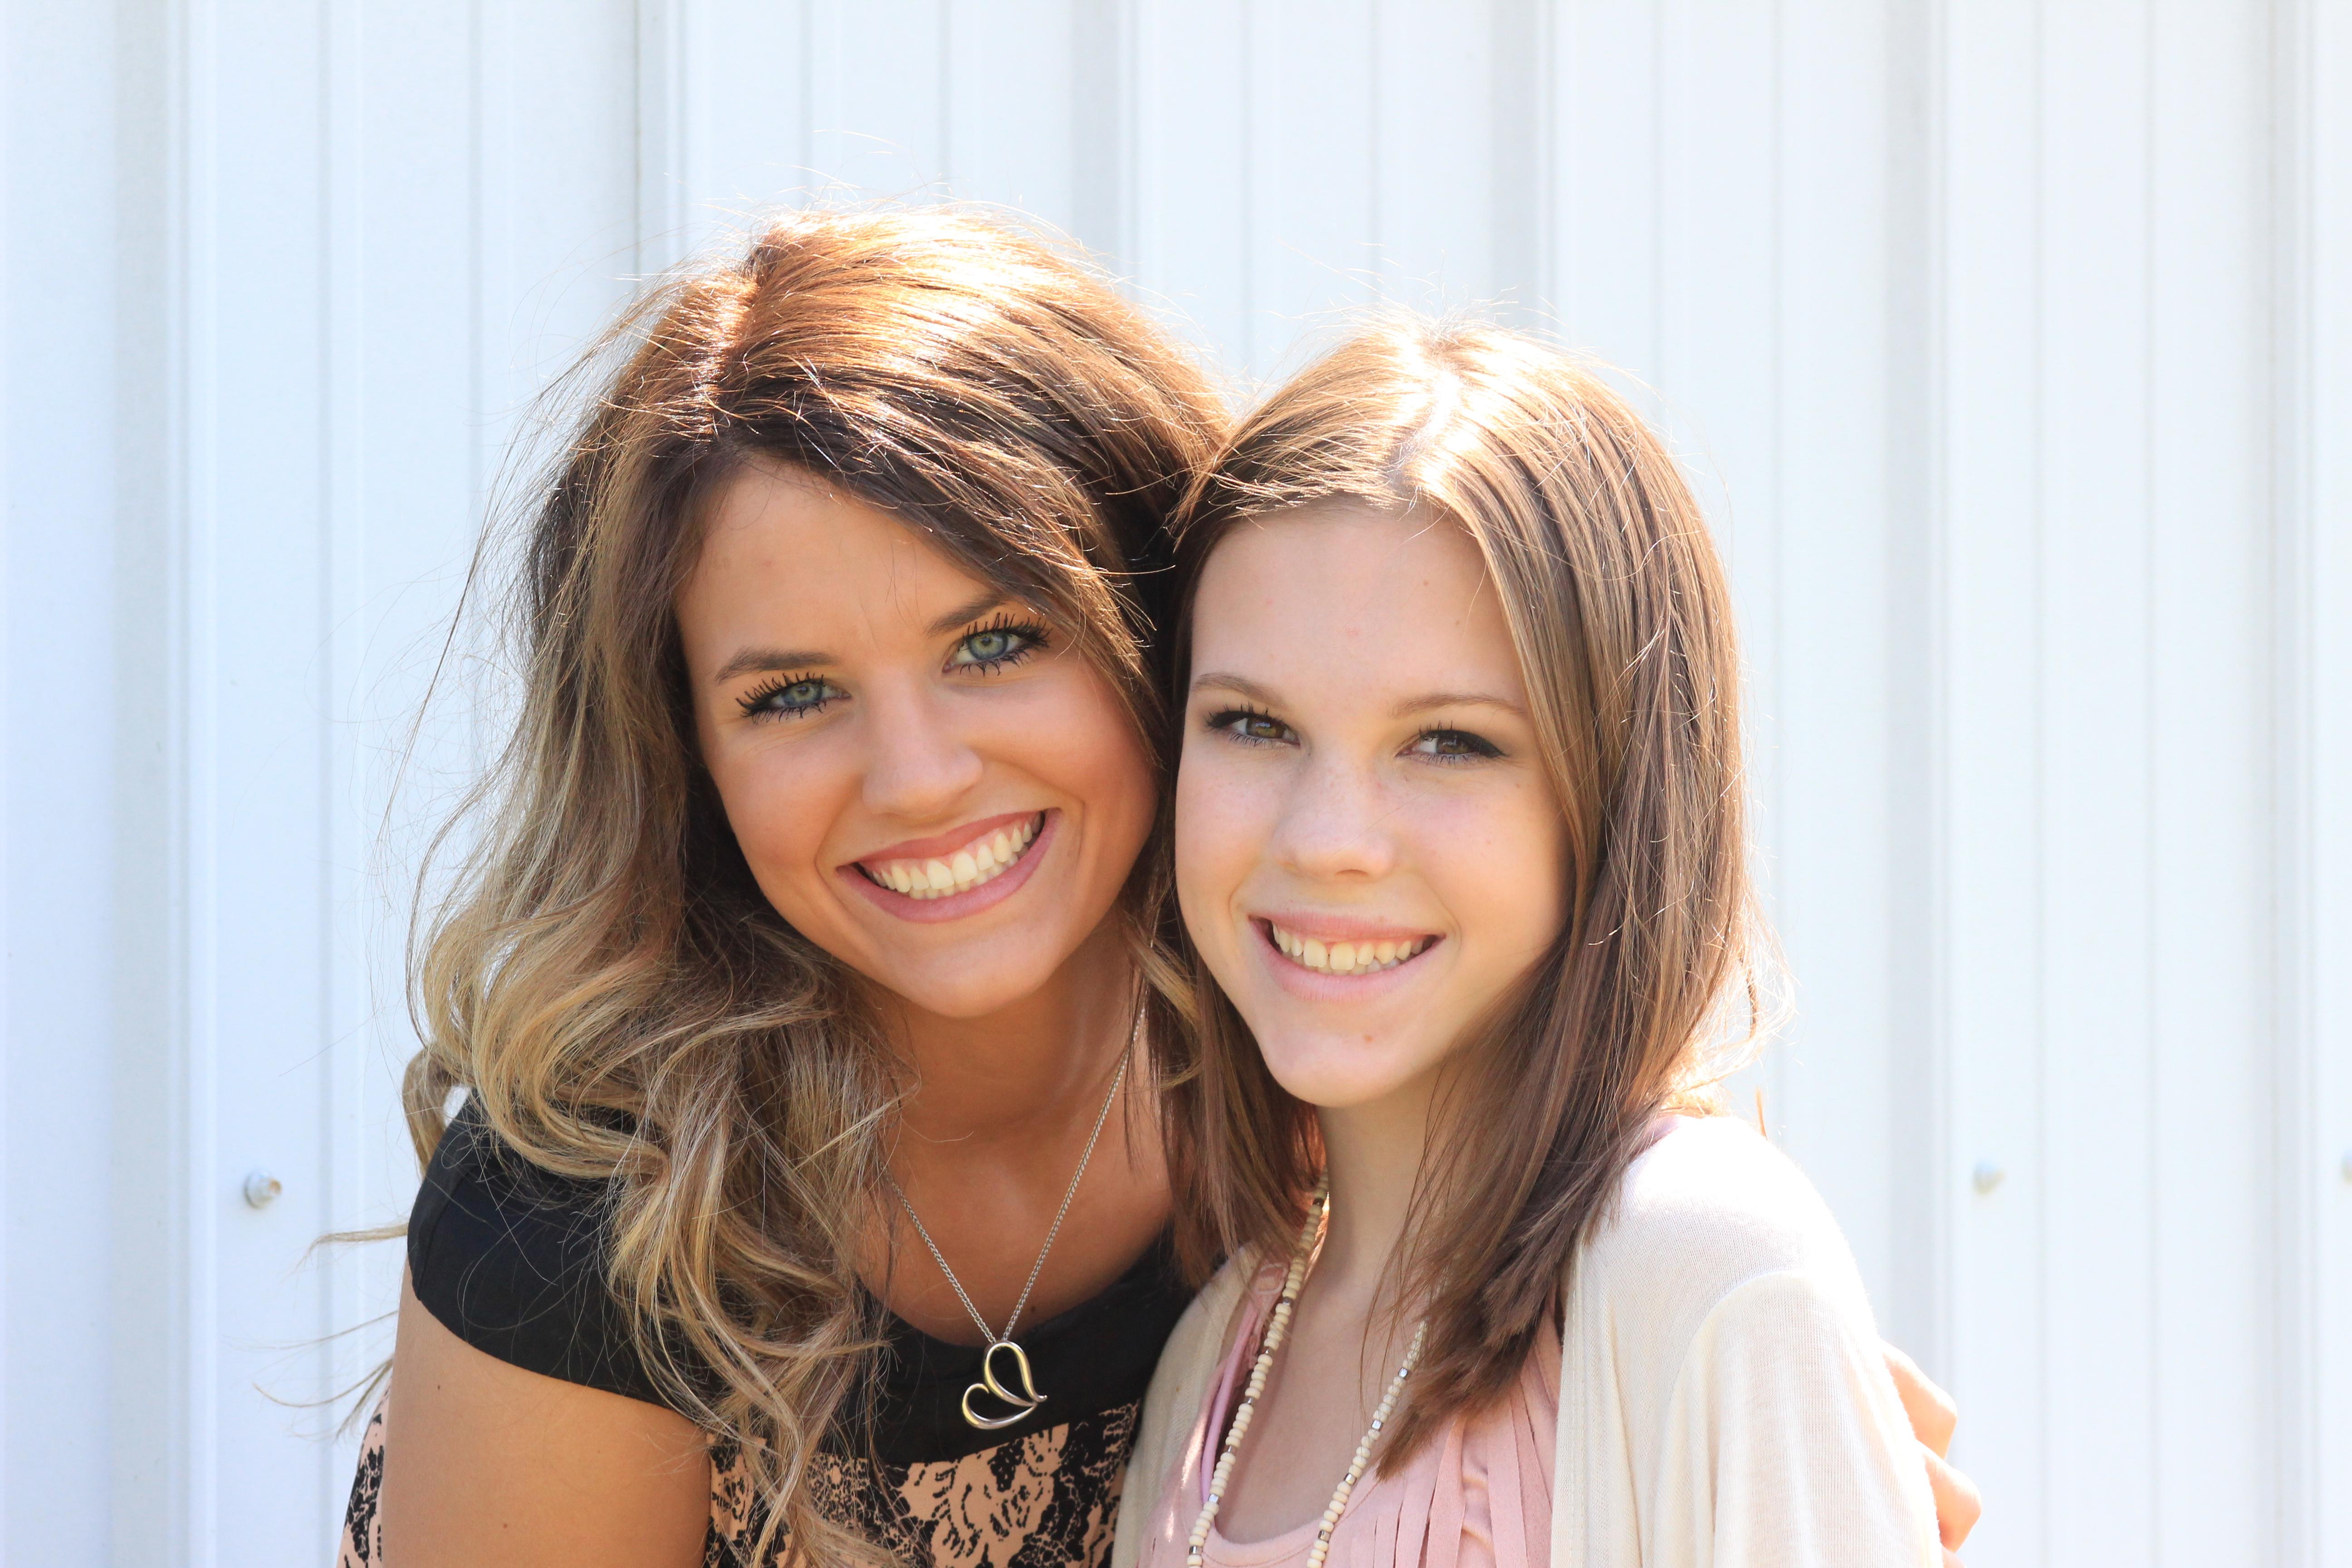 Jordan & Kaylee